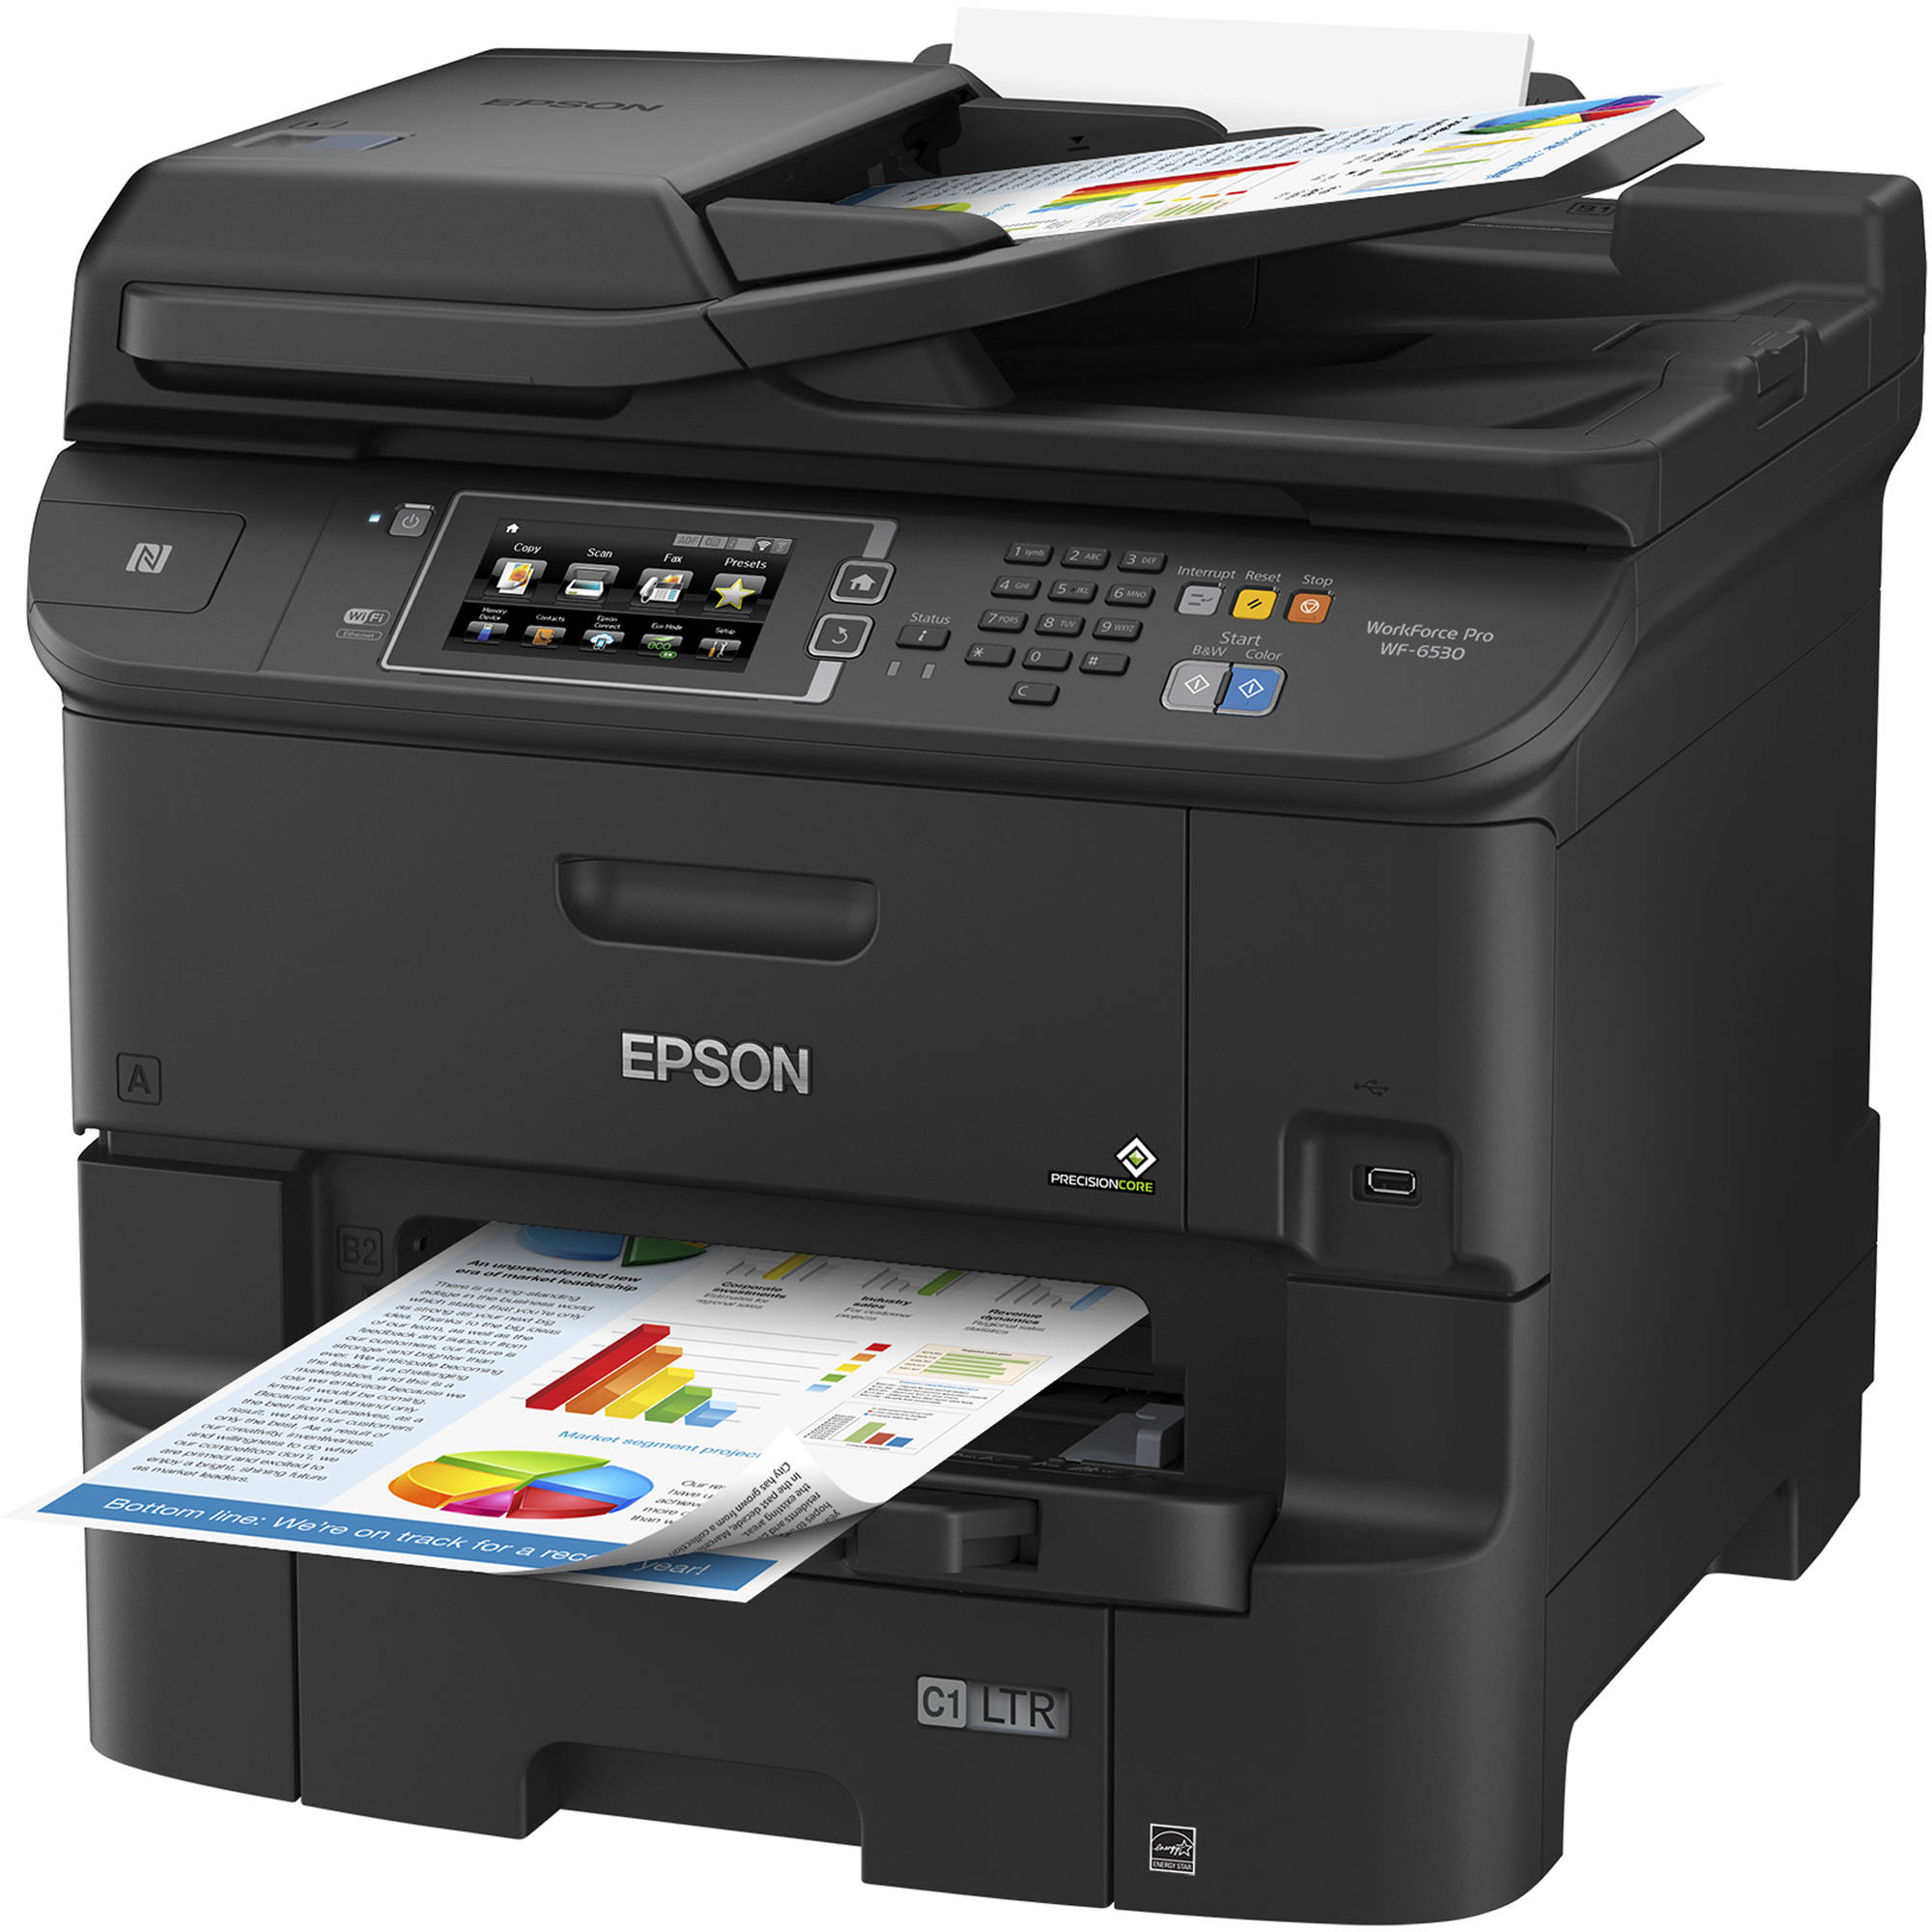 Epson WorkForce Pro WF-6530 All-in-One Inkjet Printer